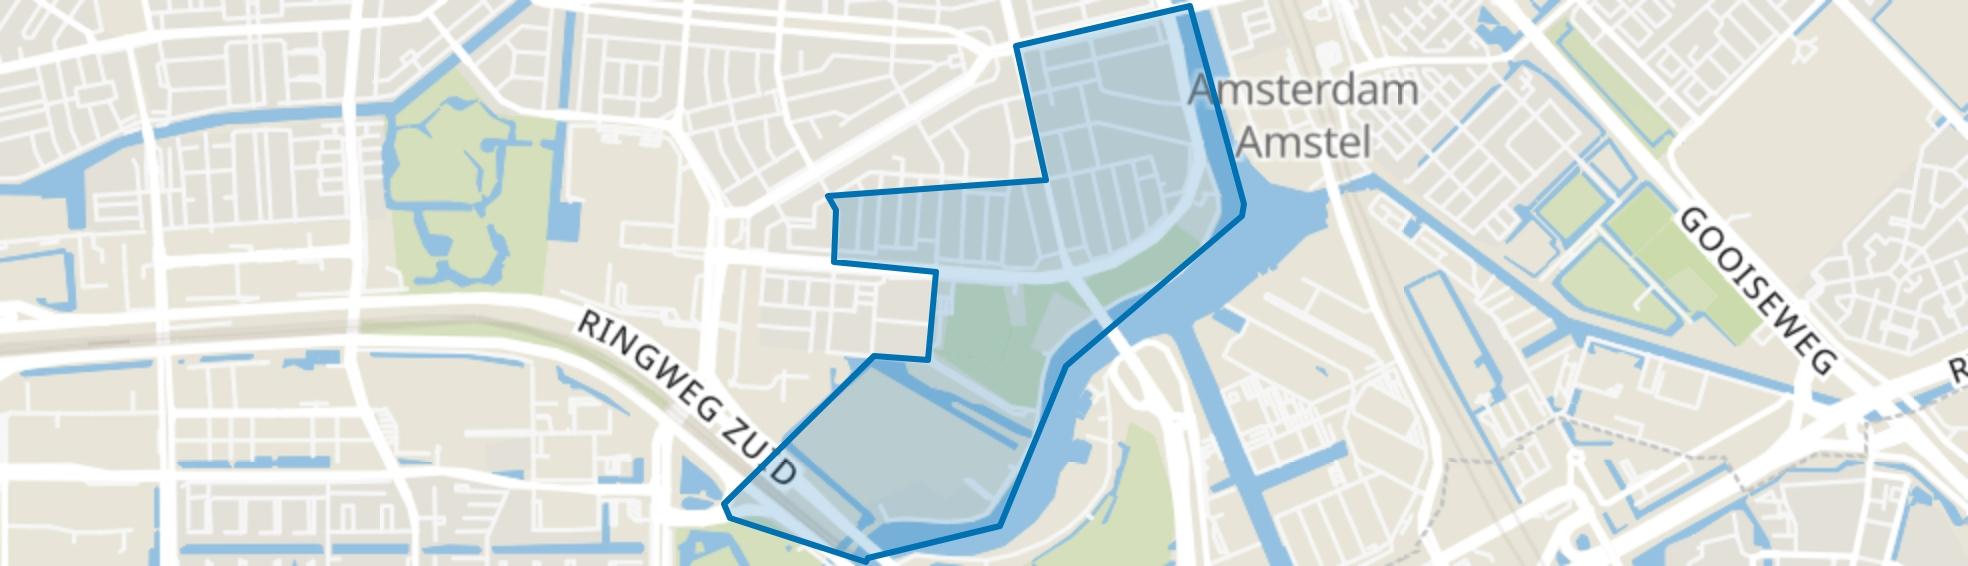 Rijnbuurt, Amsterdam map